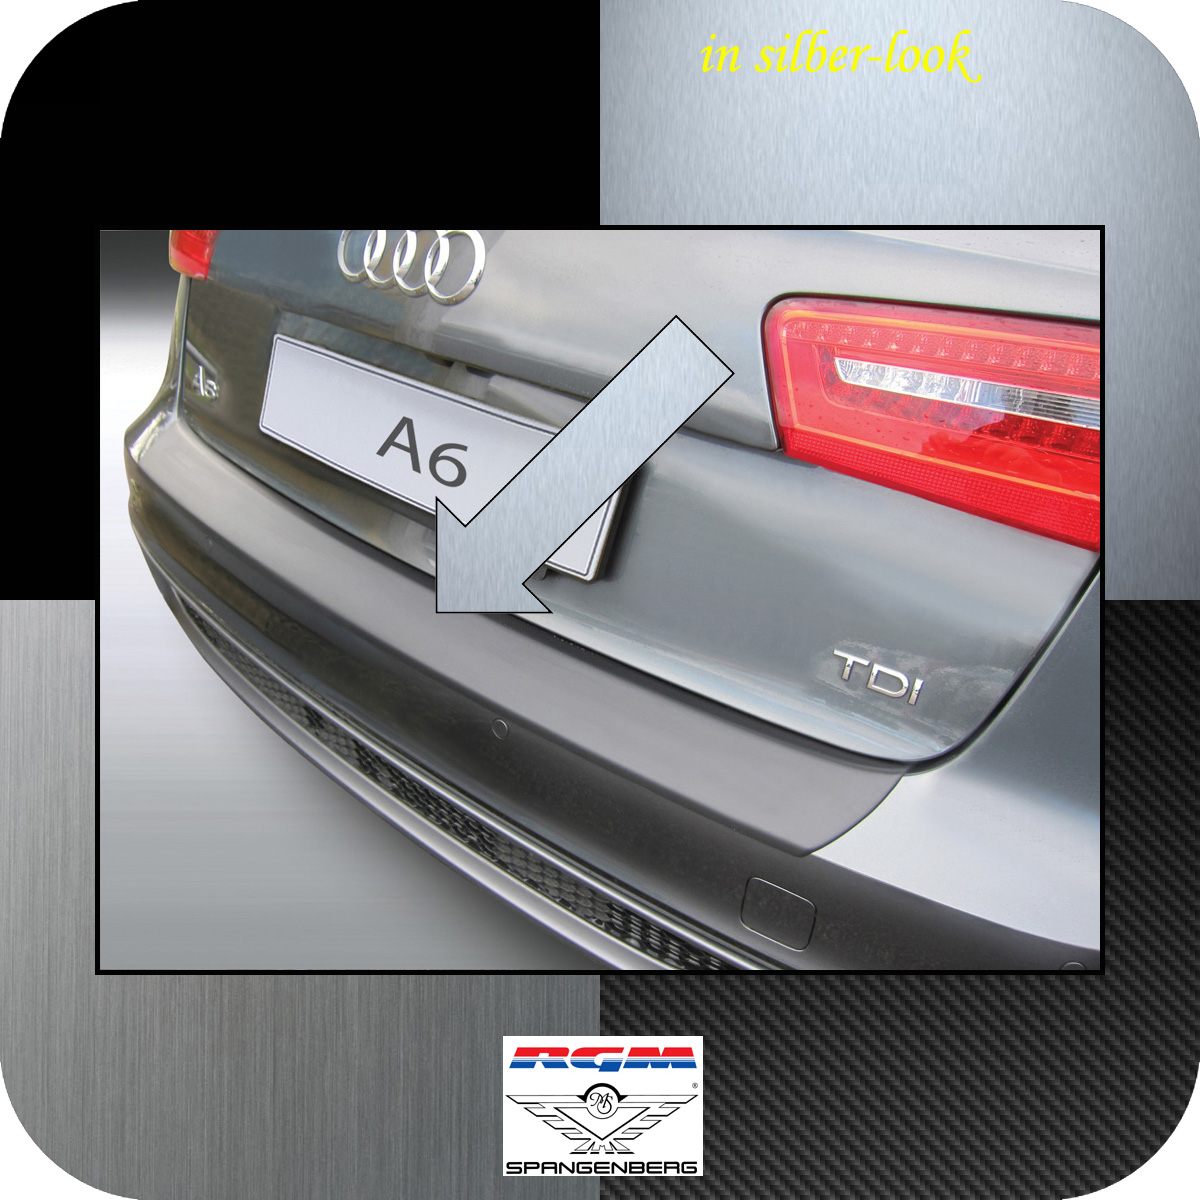 Ladekantenschutz Silber-Look Audi A6 C7 Avant Kombi vor Mopf 2011-2014 3506713